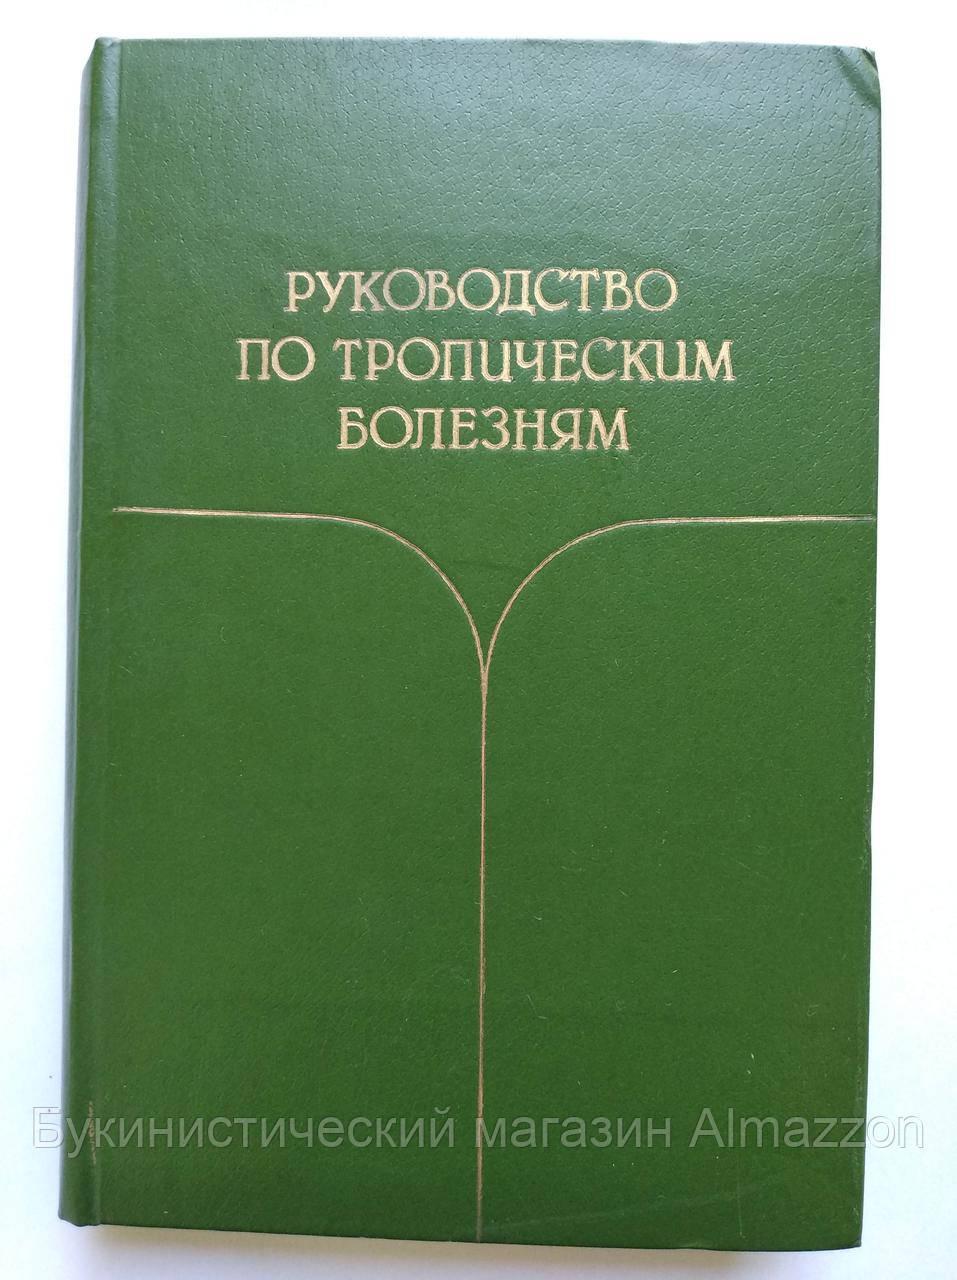 Руководство по тропическим болезням. Под ред. А.Лысенко 1983 год